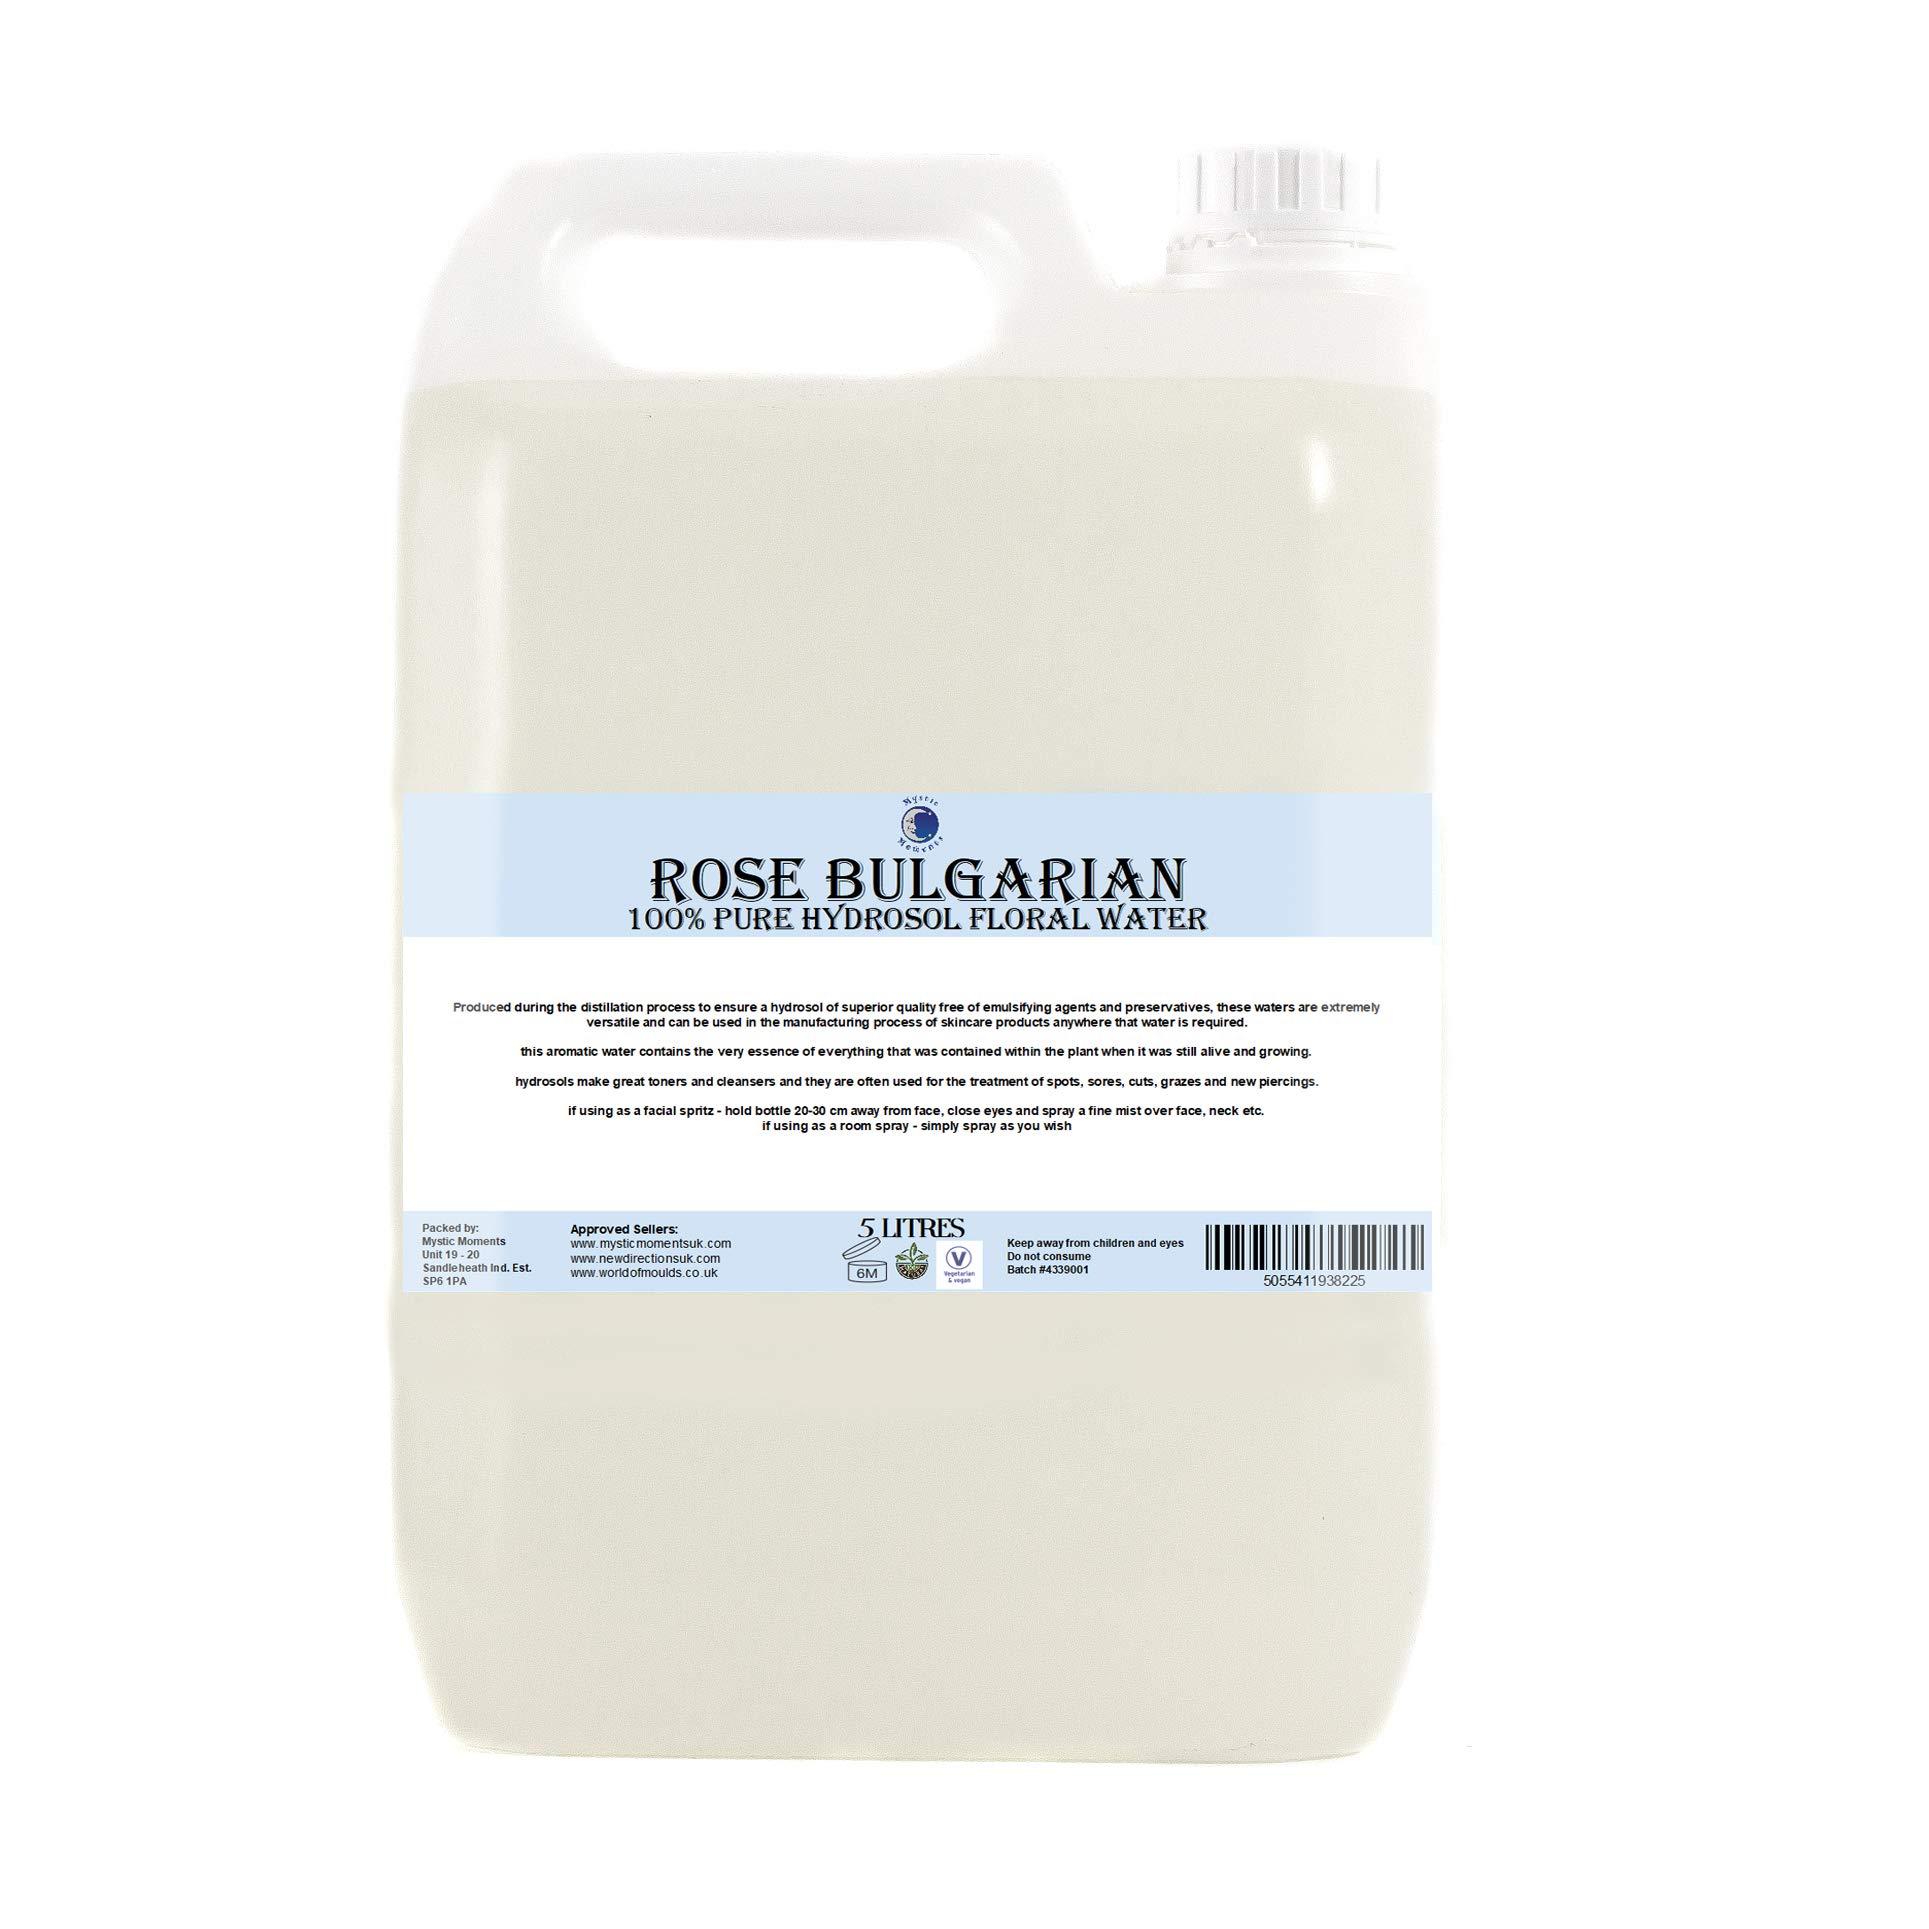 Rose Bulgarian Hydrosol Floral Water - 5Kg by BiOrigins (Image #1)